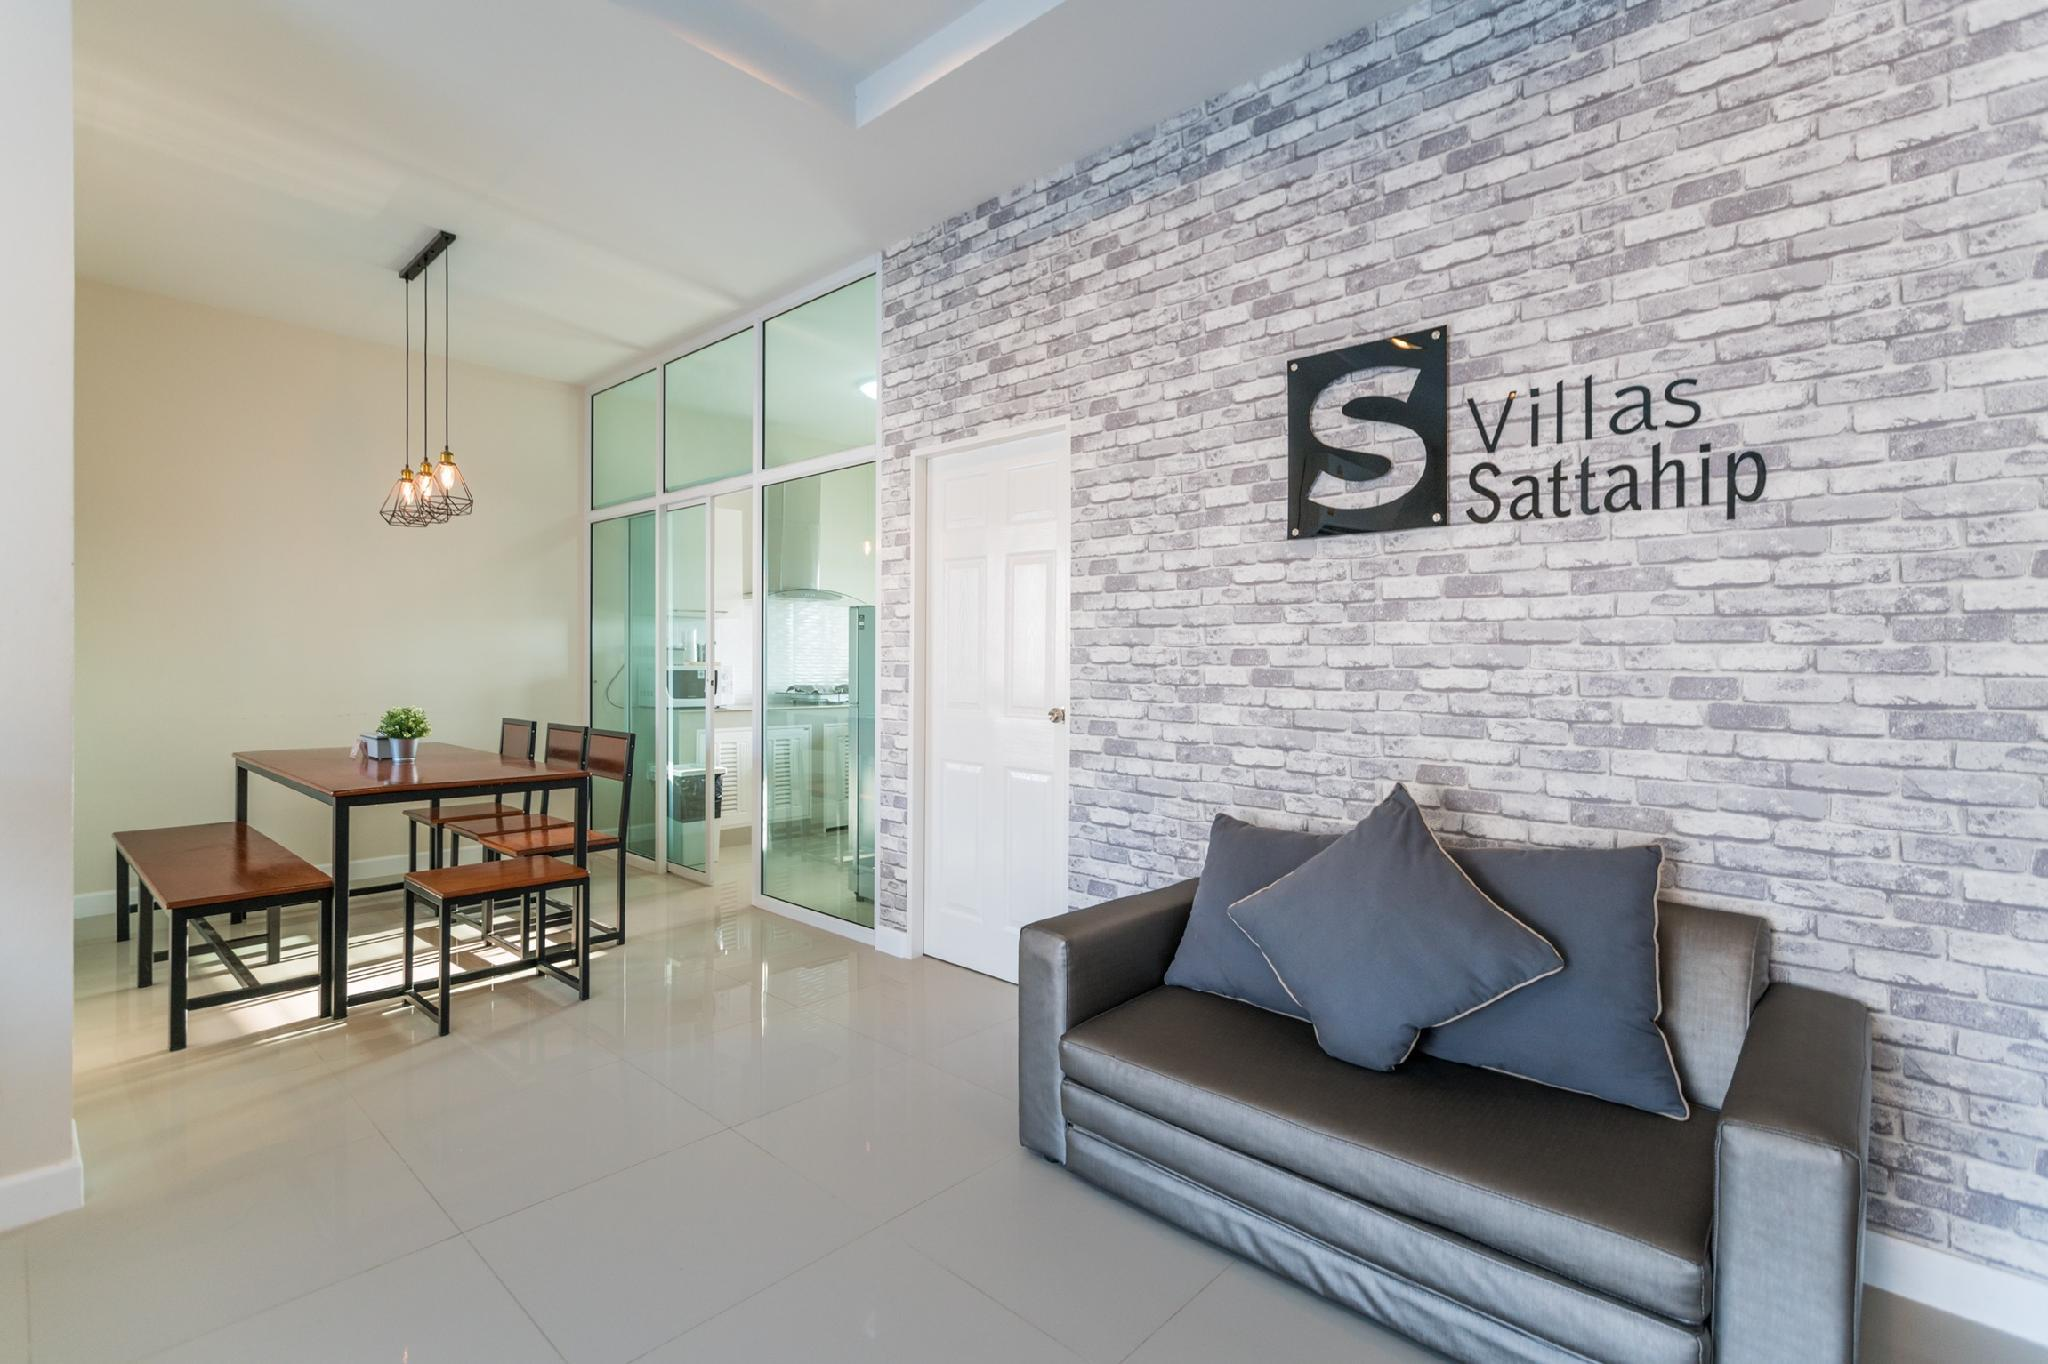 S Villas Sattahip